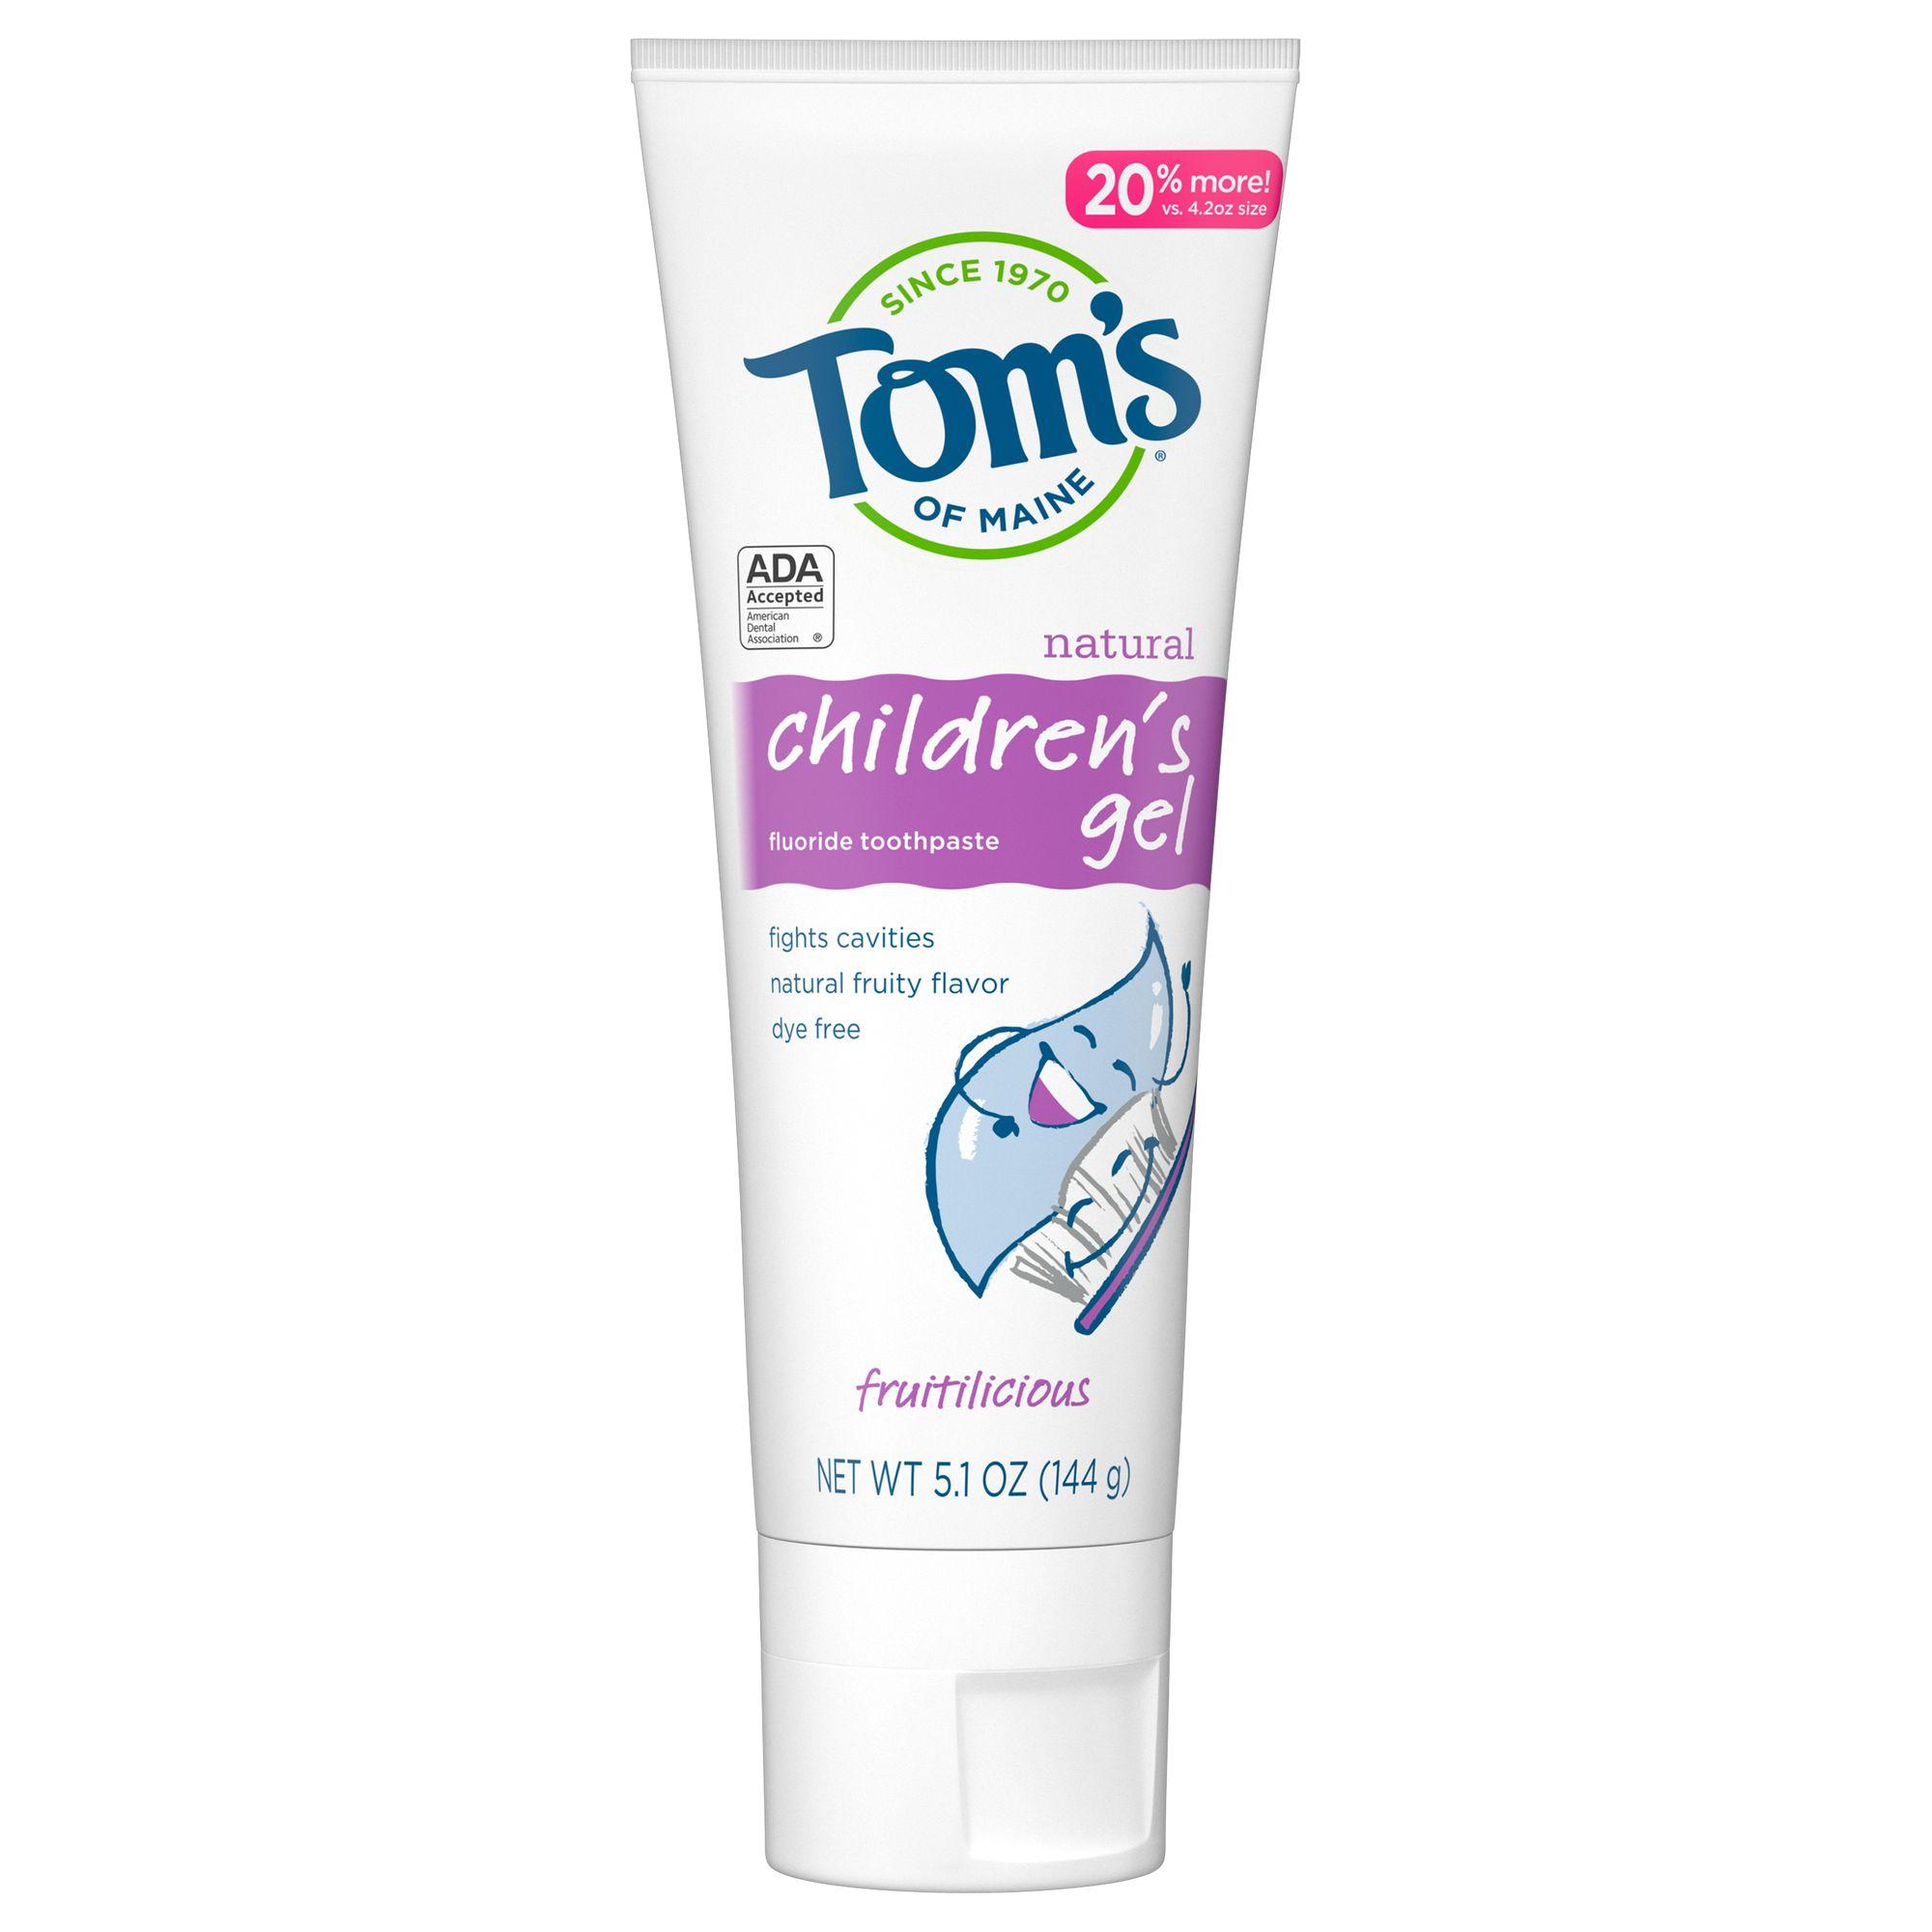 Tom's of Maine Children's Gel